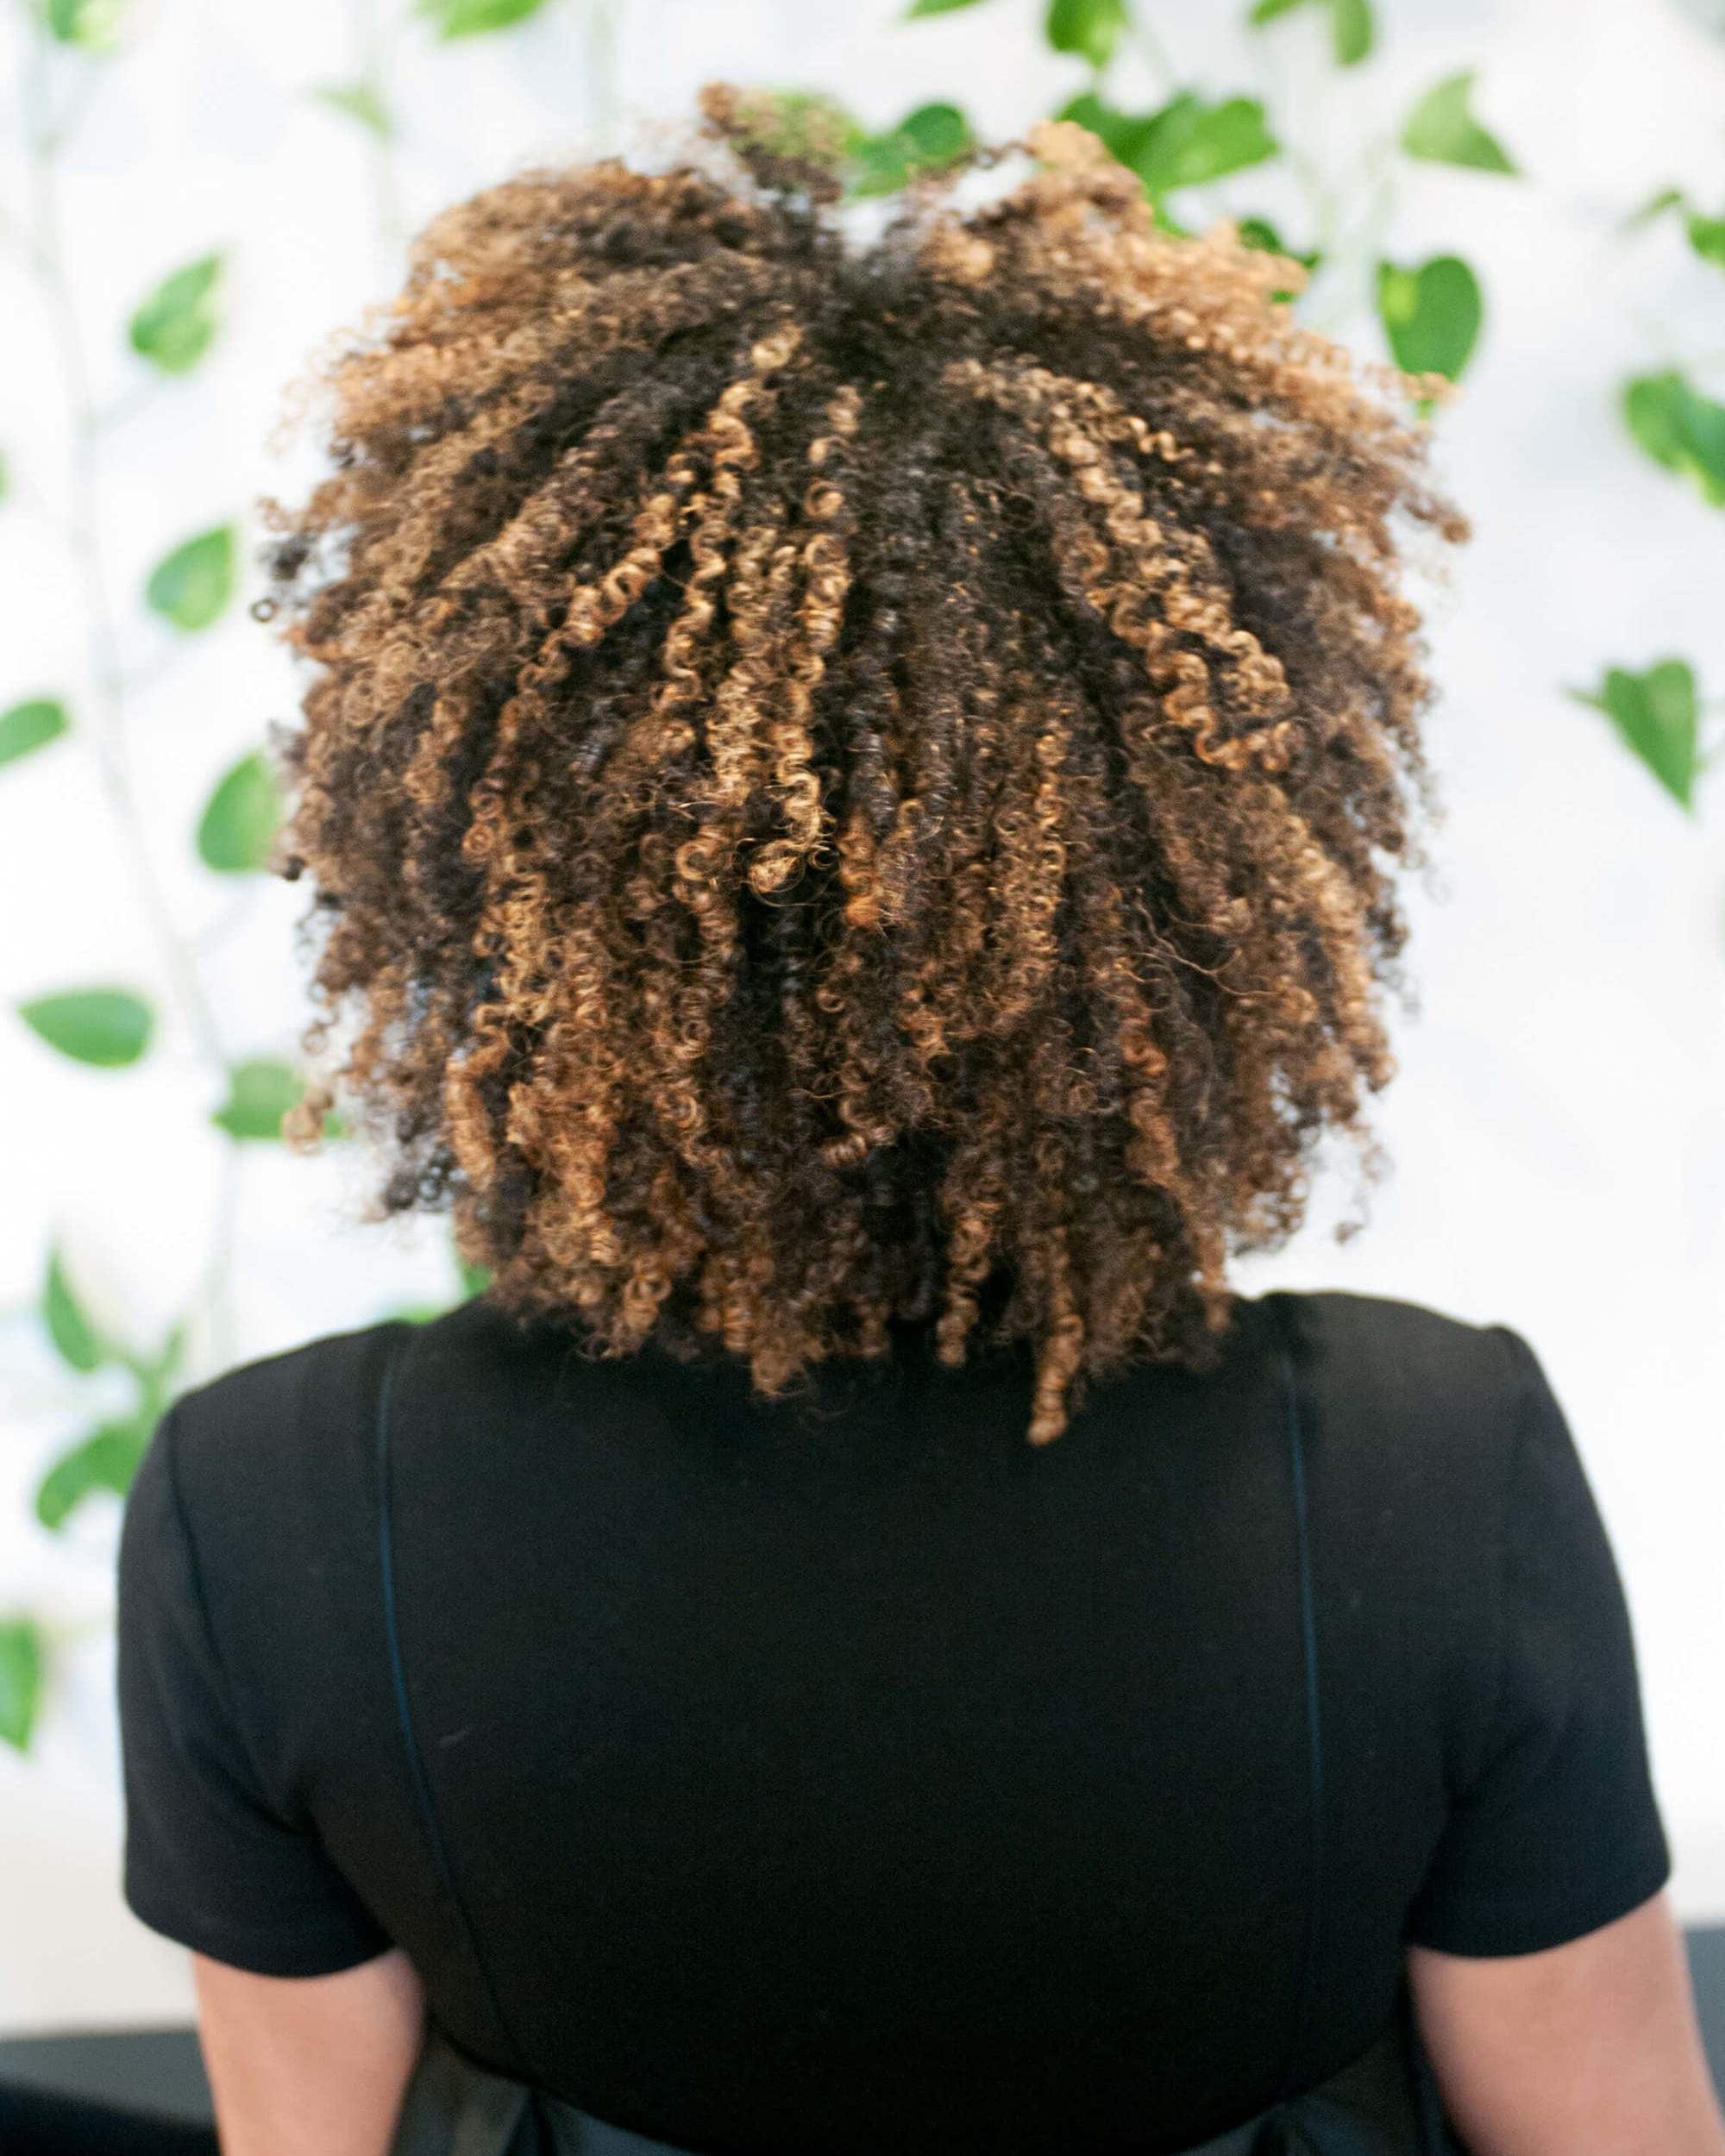 shingling-hair-method-priscilla-quaye-color-treated-curls.jpg